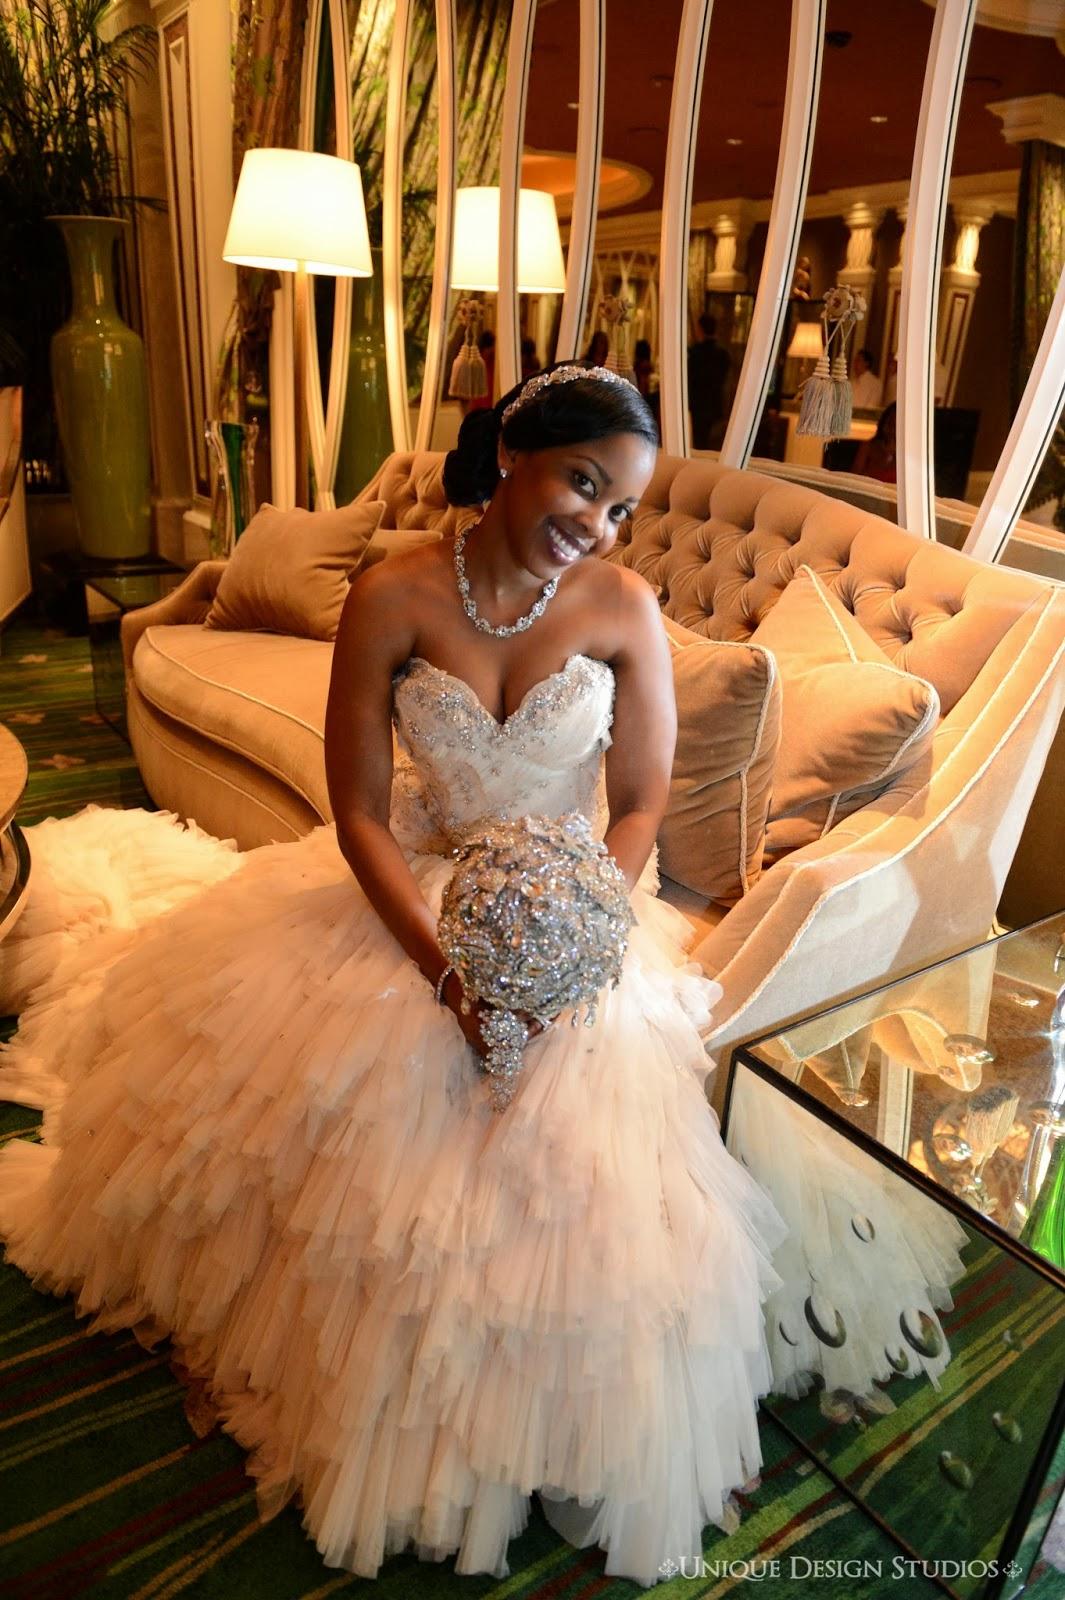 Tiffany Cook Events: OMG Unbelievable Las Vegas Wedding